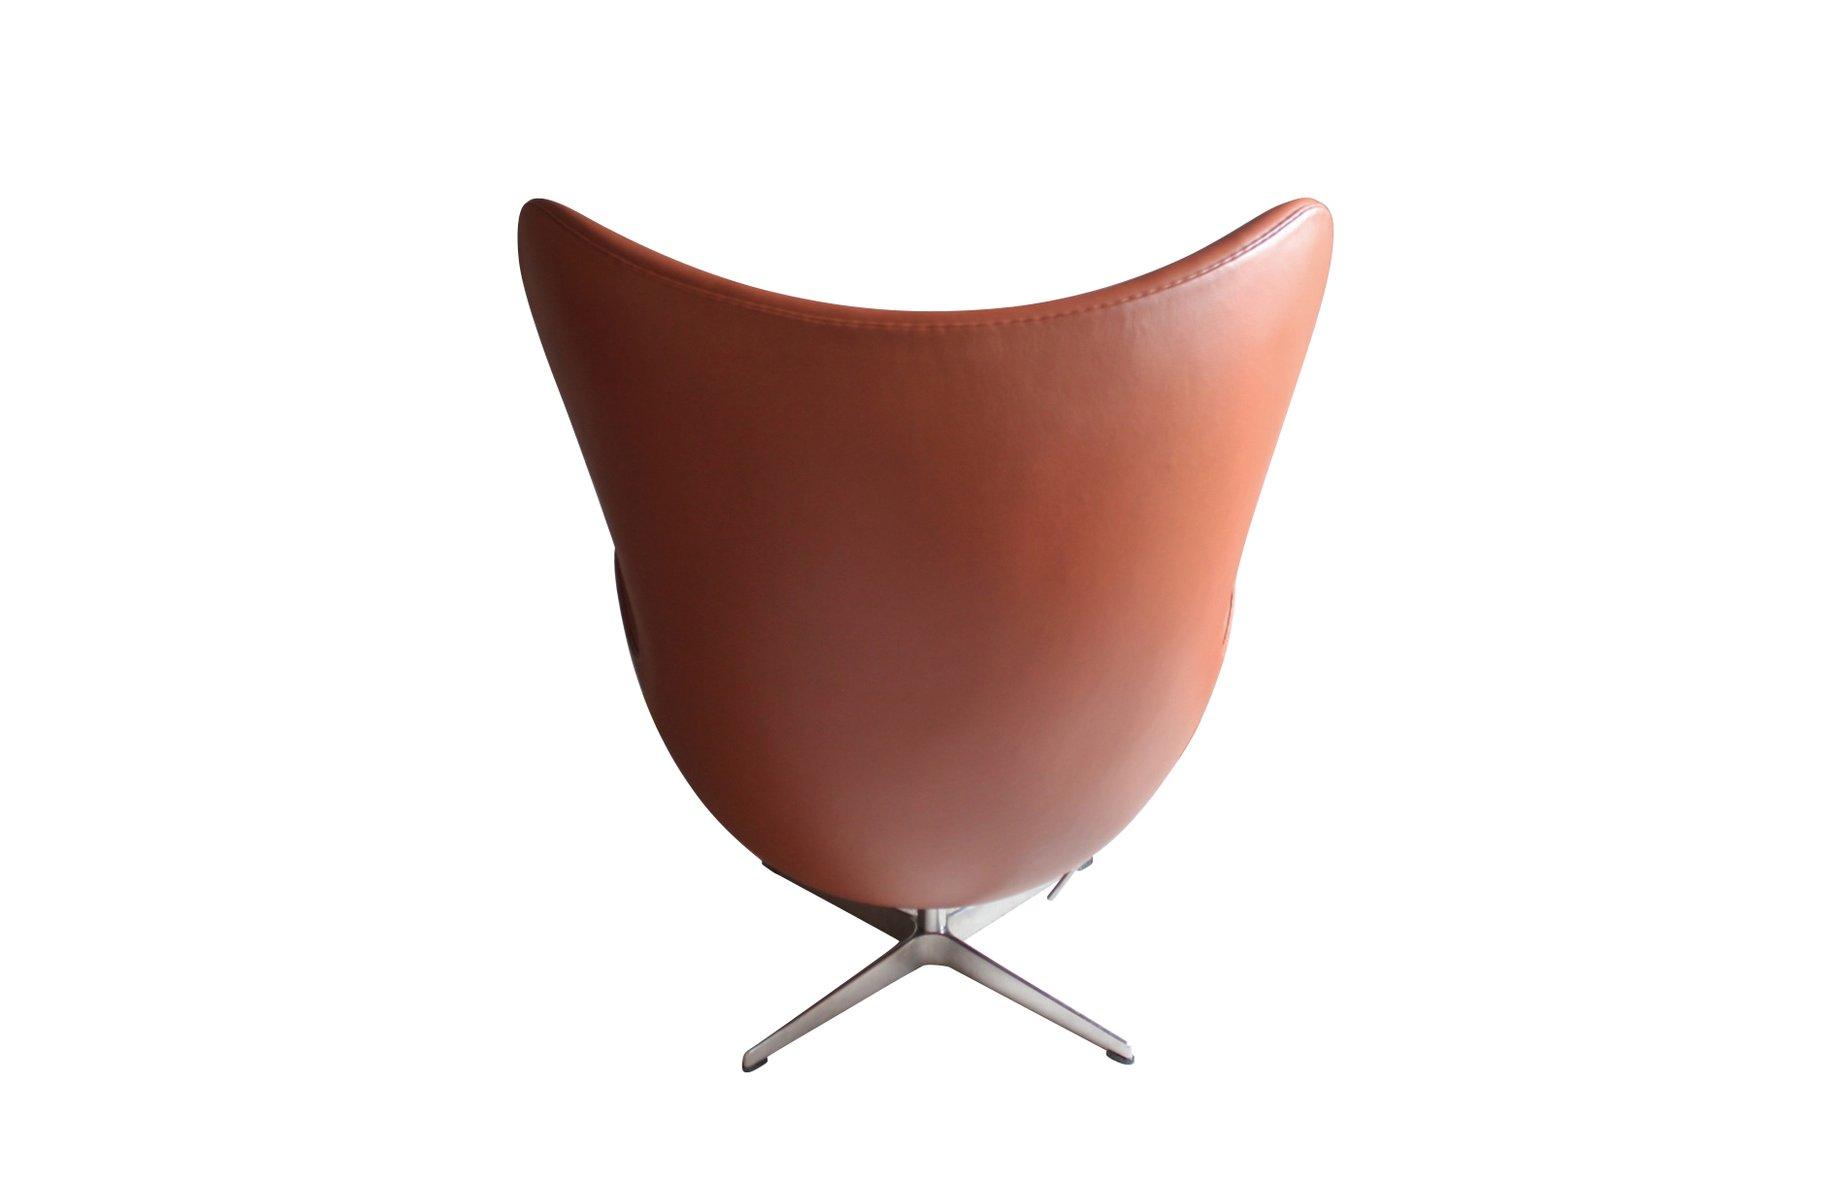 danish the egg chair by arne jacobsen for fritz hansen. Black Bedroom Furniture Sets. Home Design Ideas